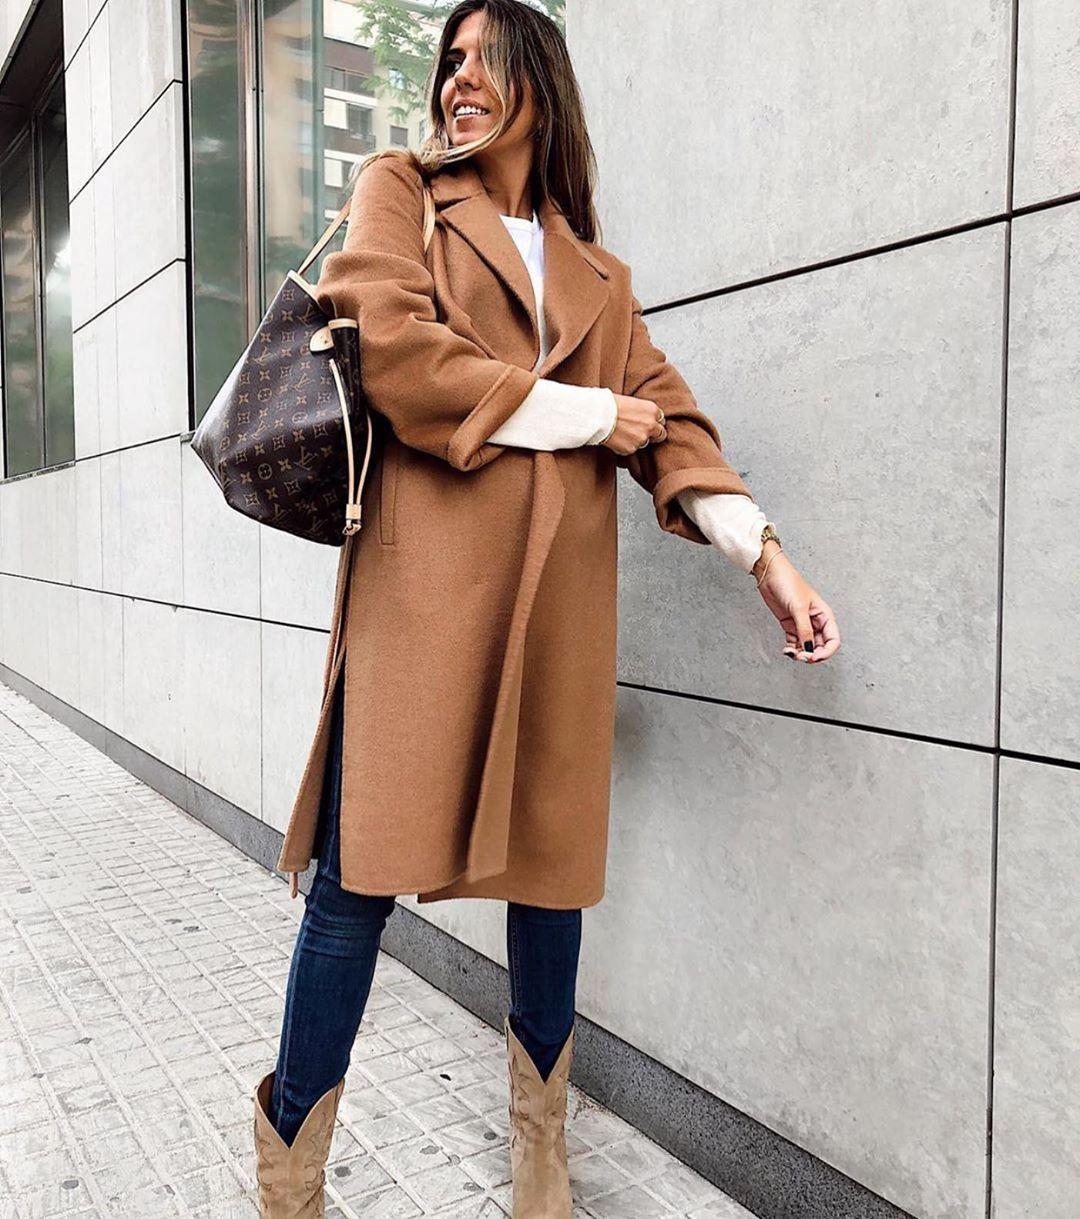 crossover breasted coat with belt de Zara sur zaraaddiction